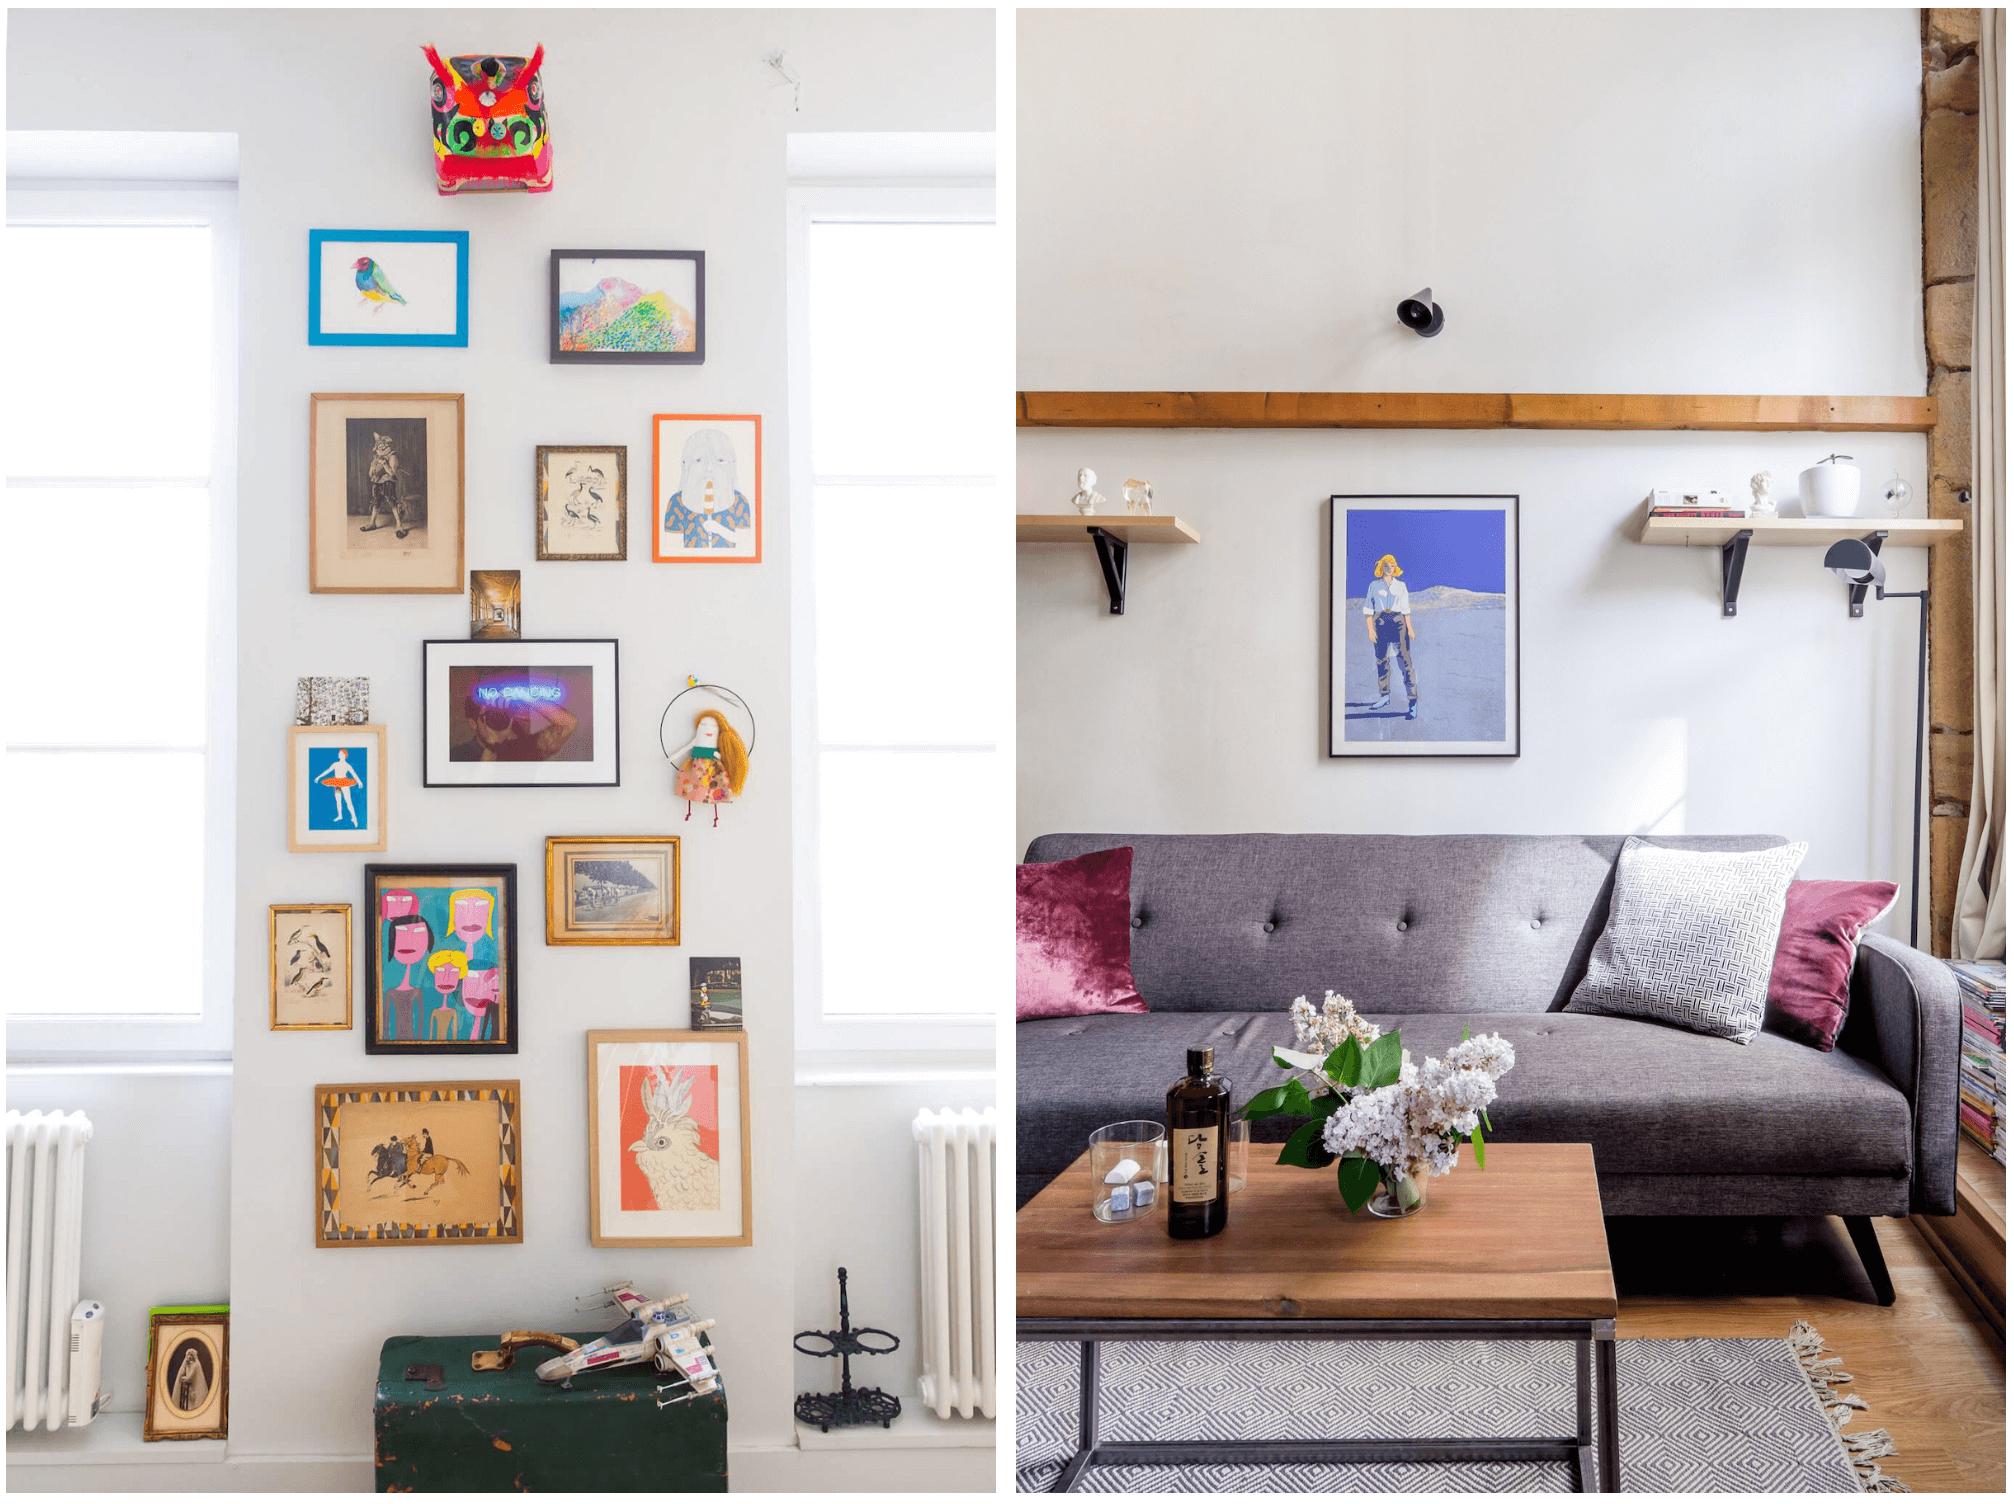 bumper-blog-news-immobilier-lyon-appartement-vente-achat-investir-homestaging-design-decoration-lifestyle-art-10.png